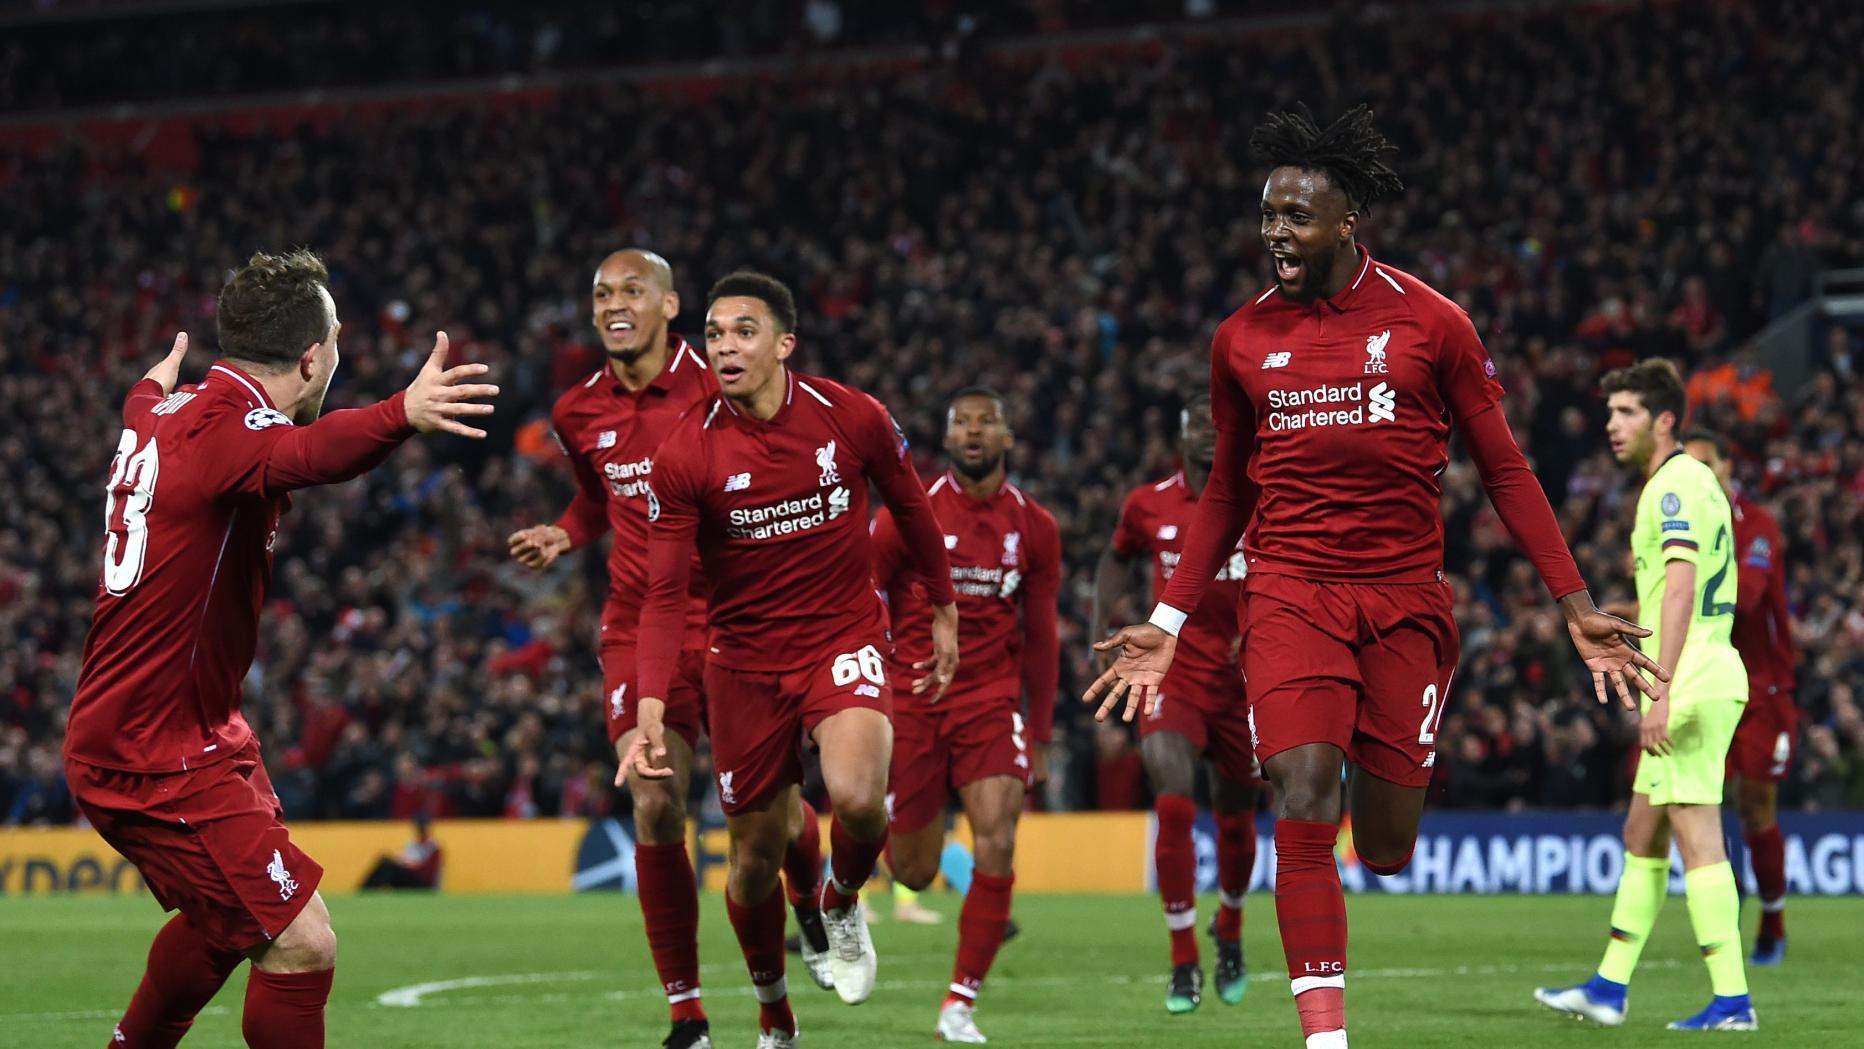 Kemenangan Liverpool Inspirasi Perdana Mentri Inggris